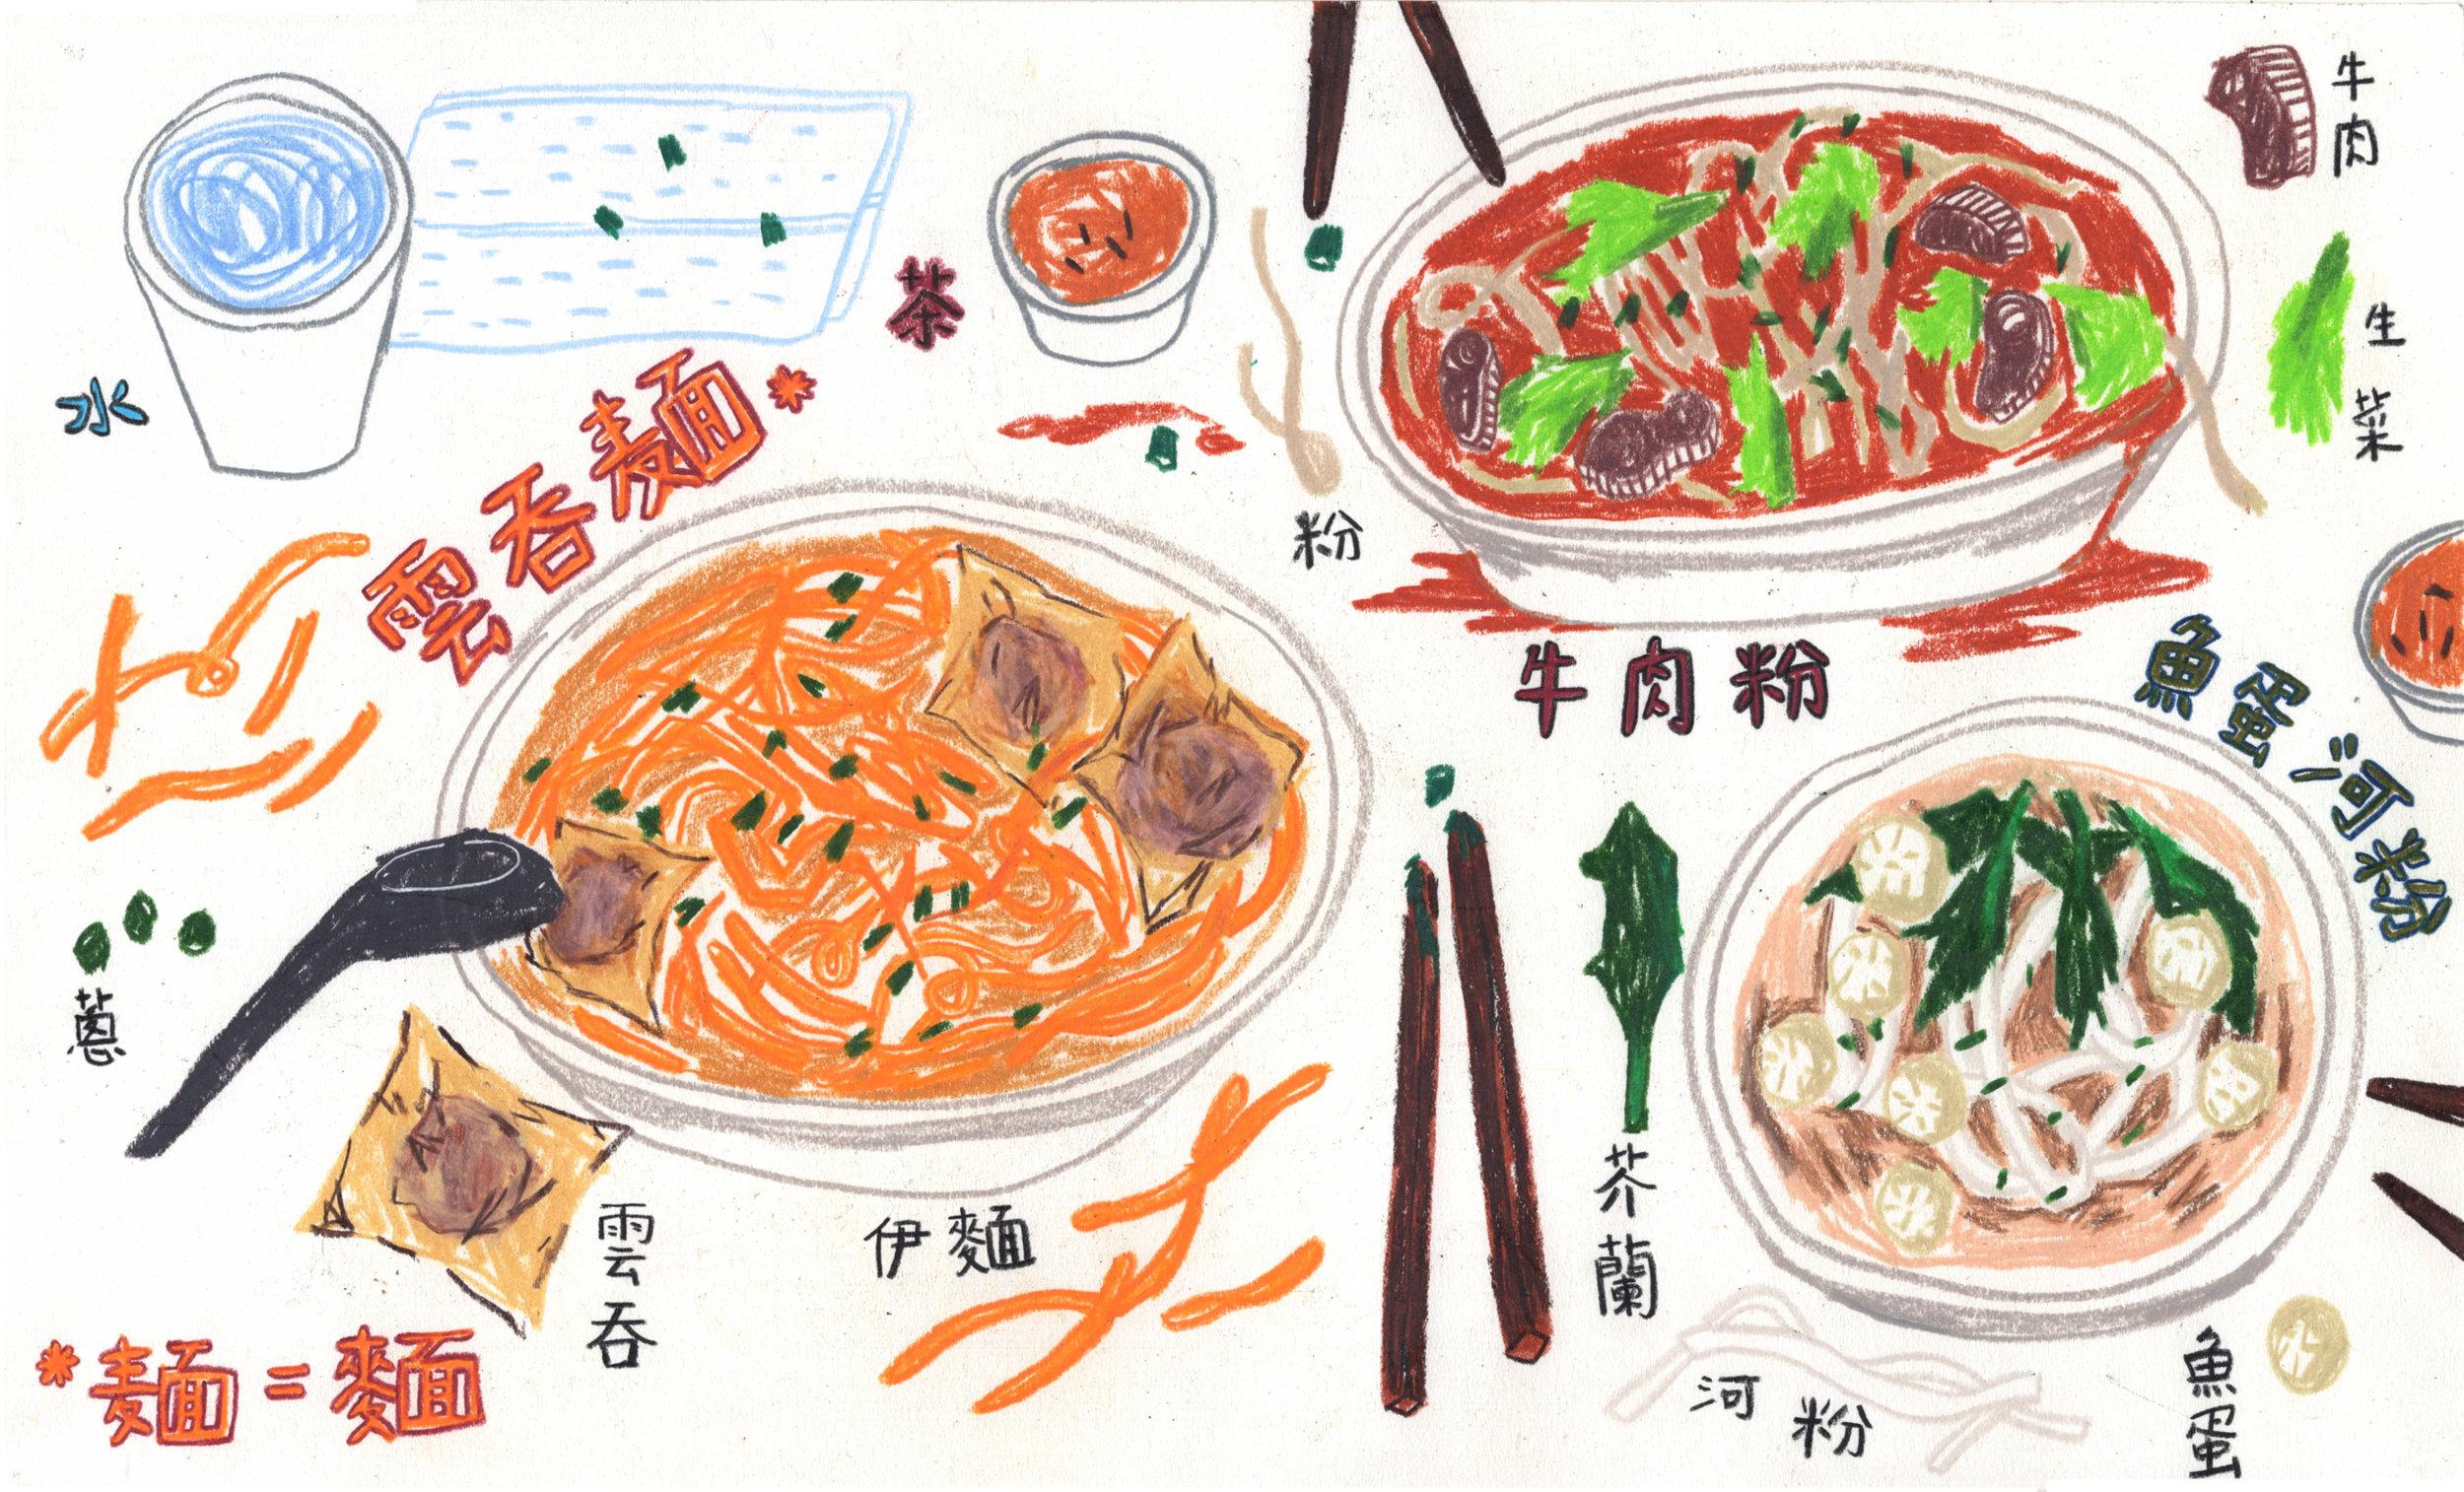 hk_noodles.jpg